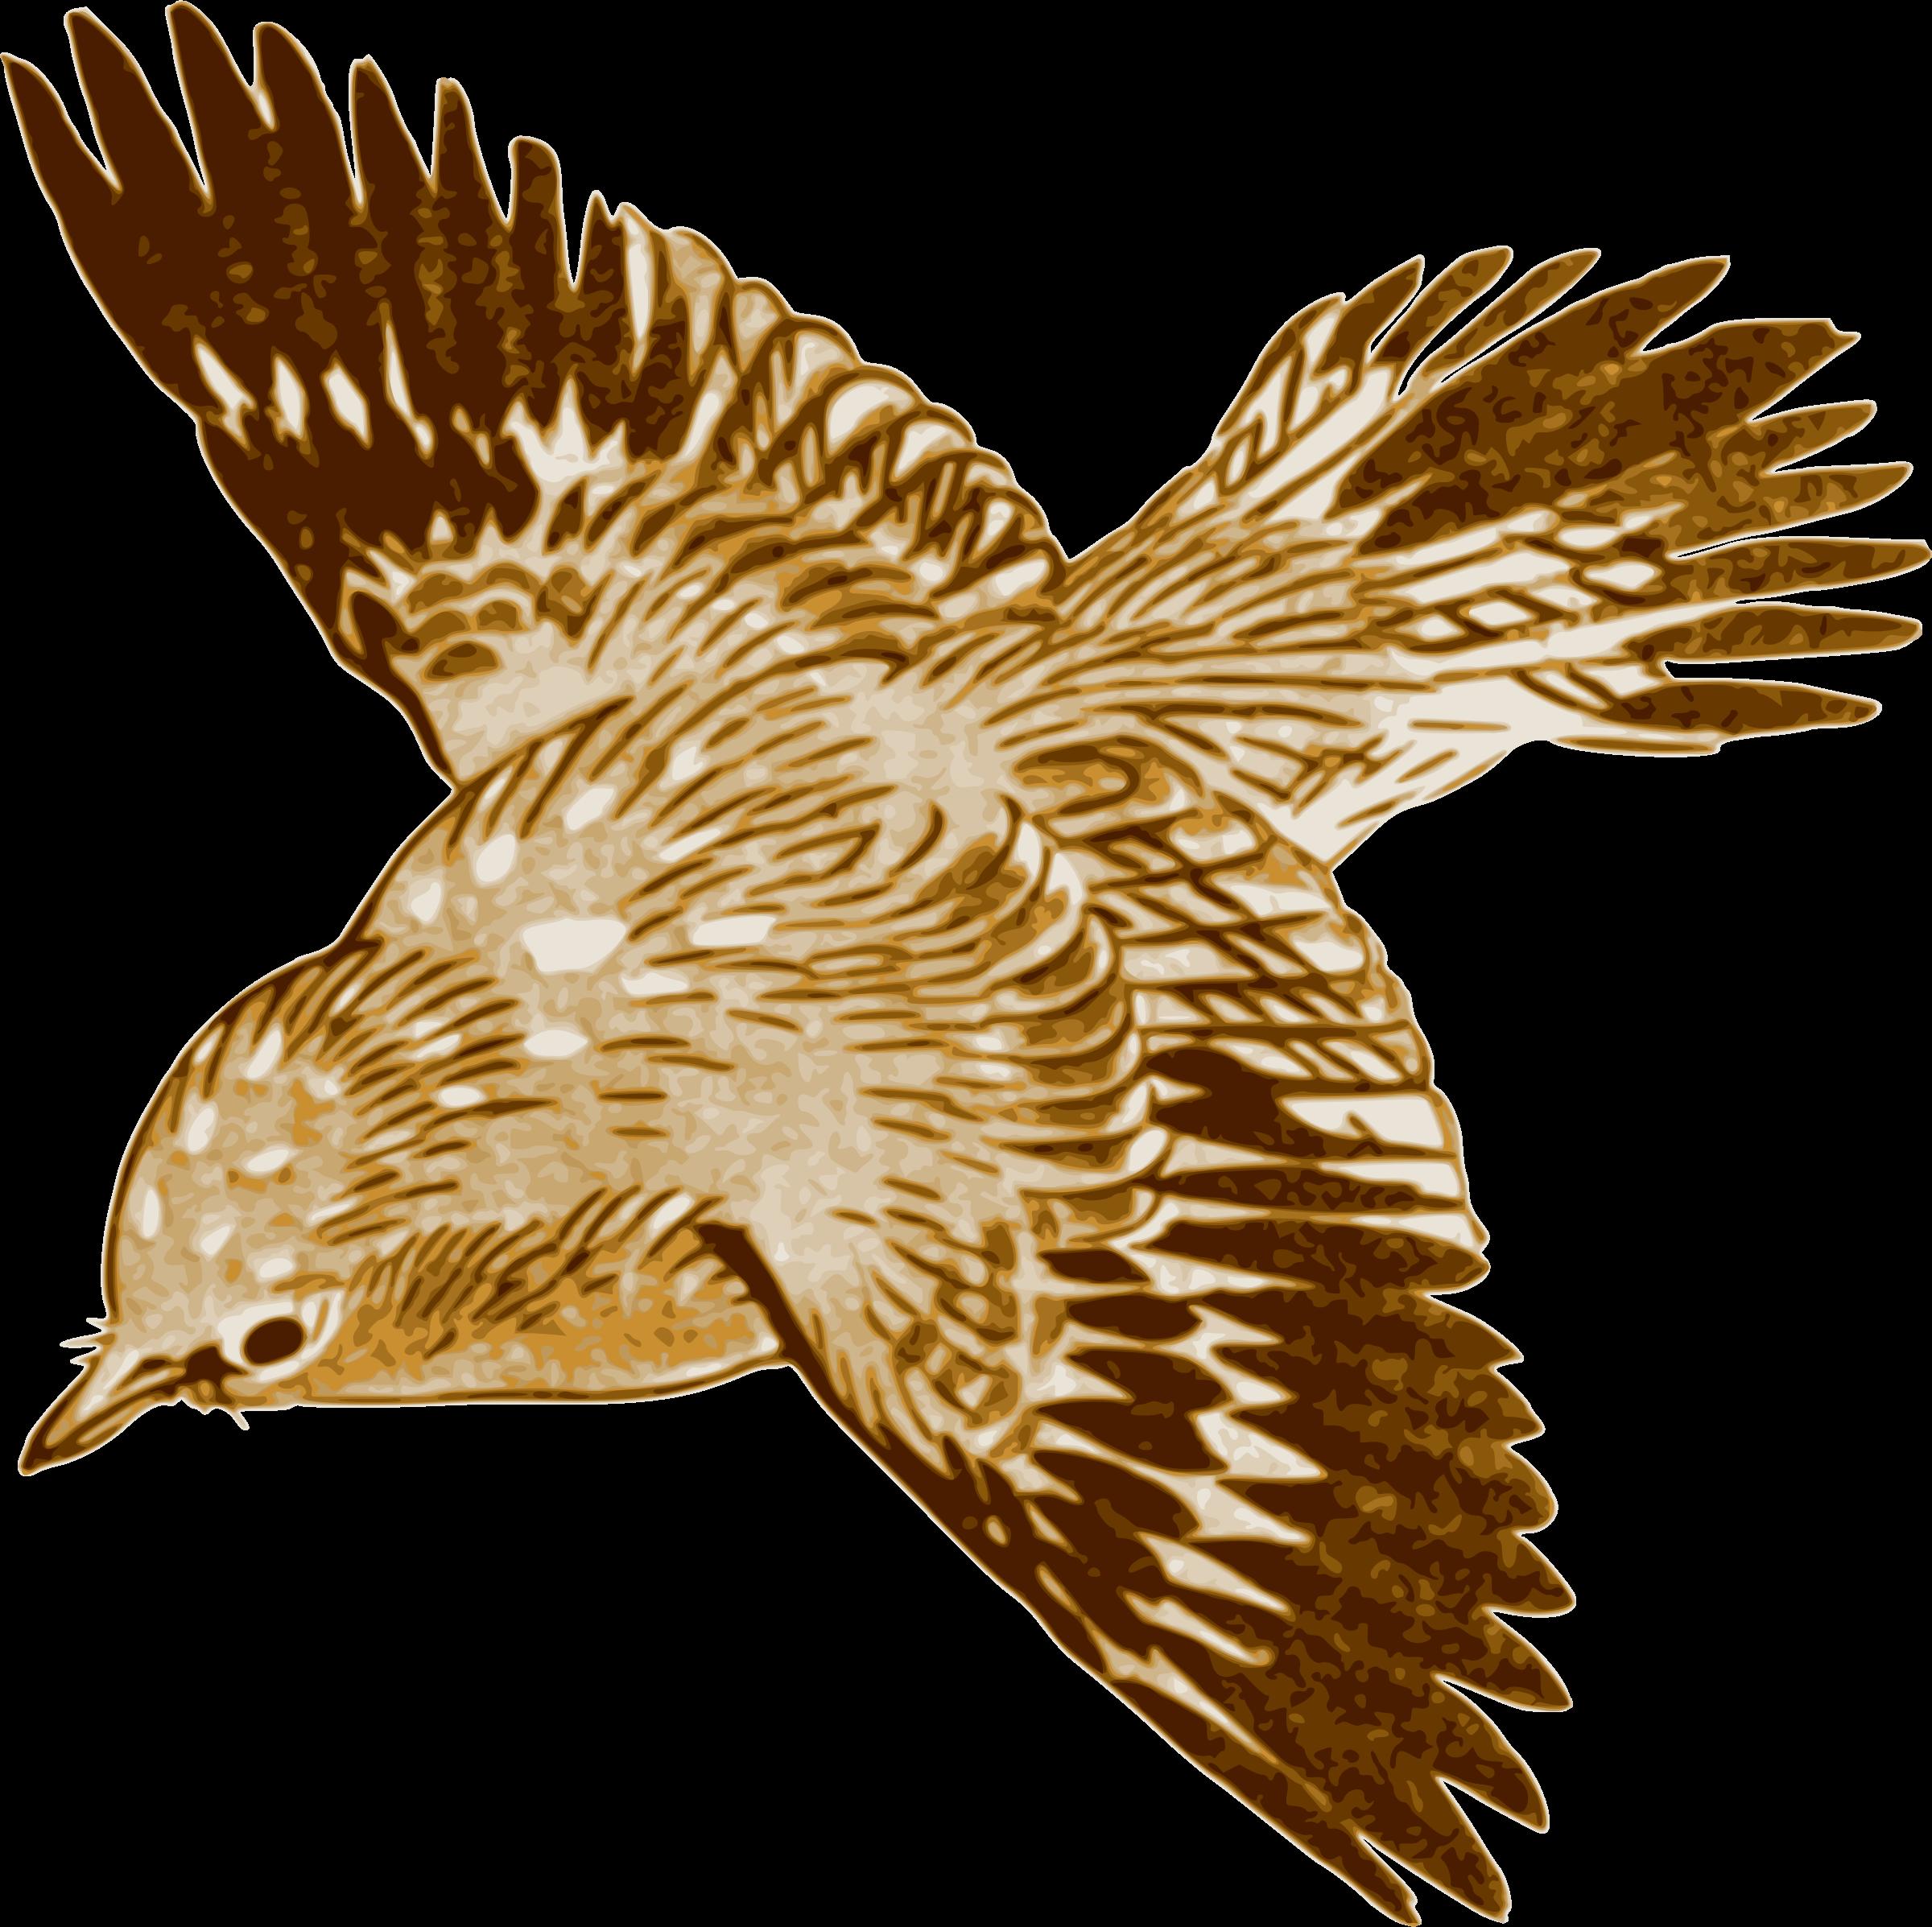 Bird big image png. Clipart birds red kite